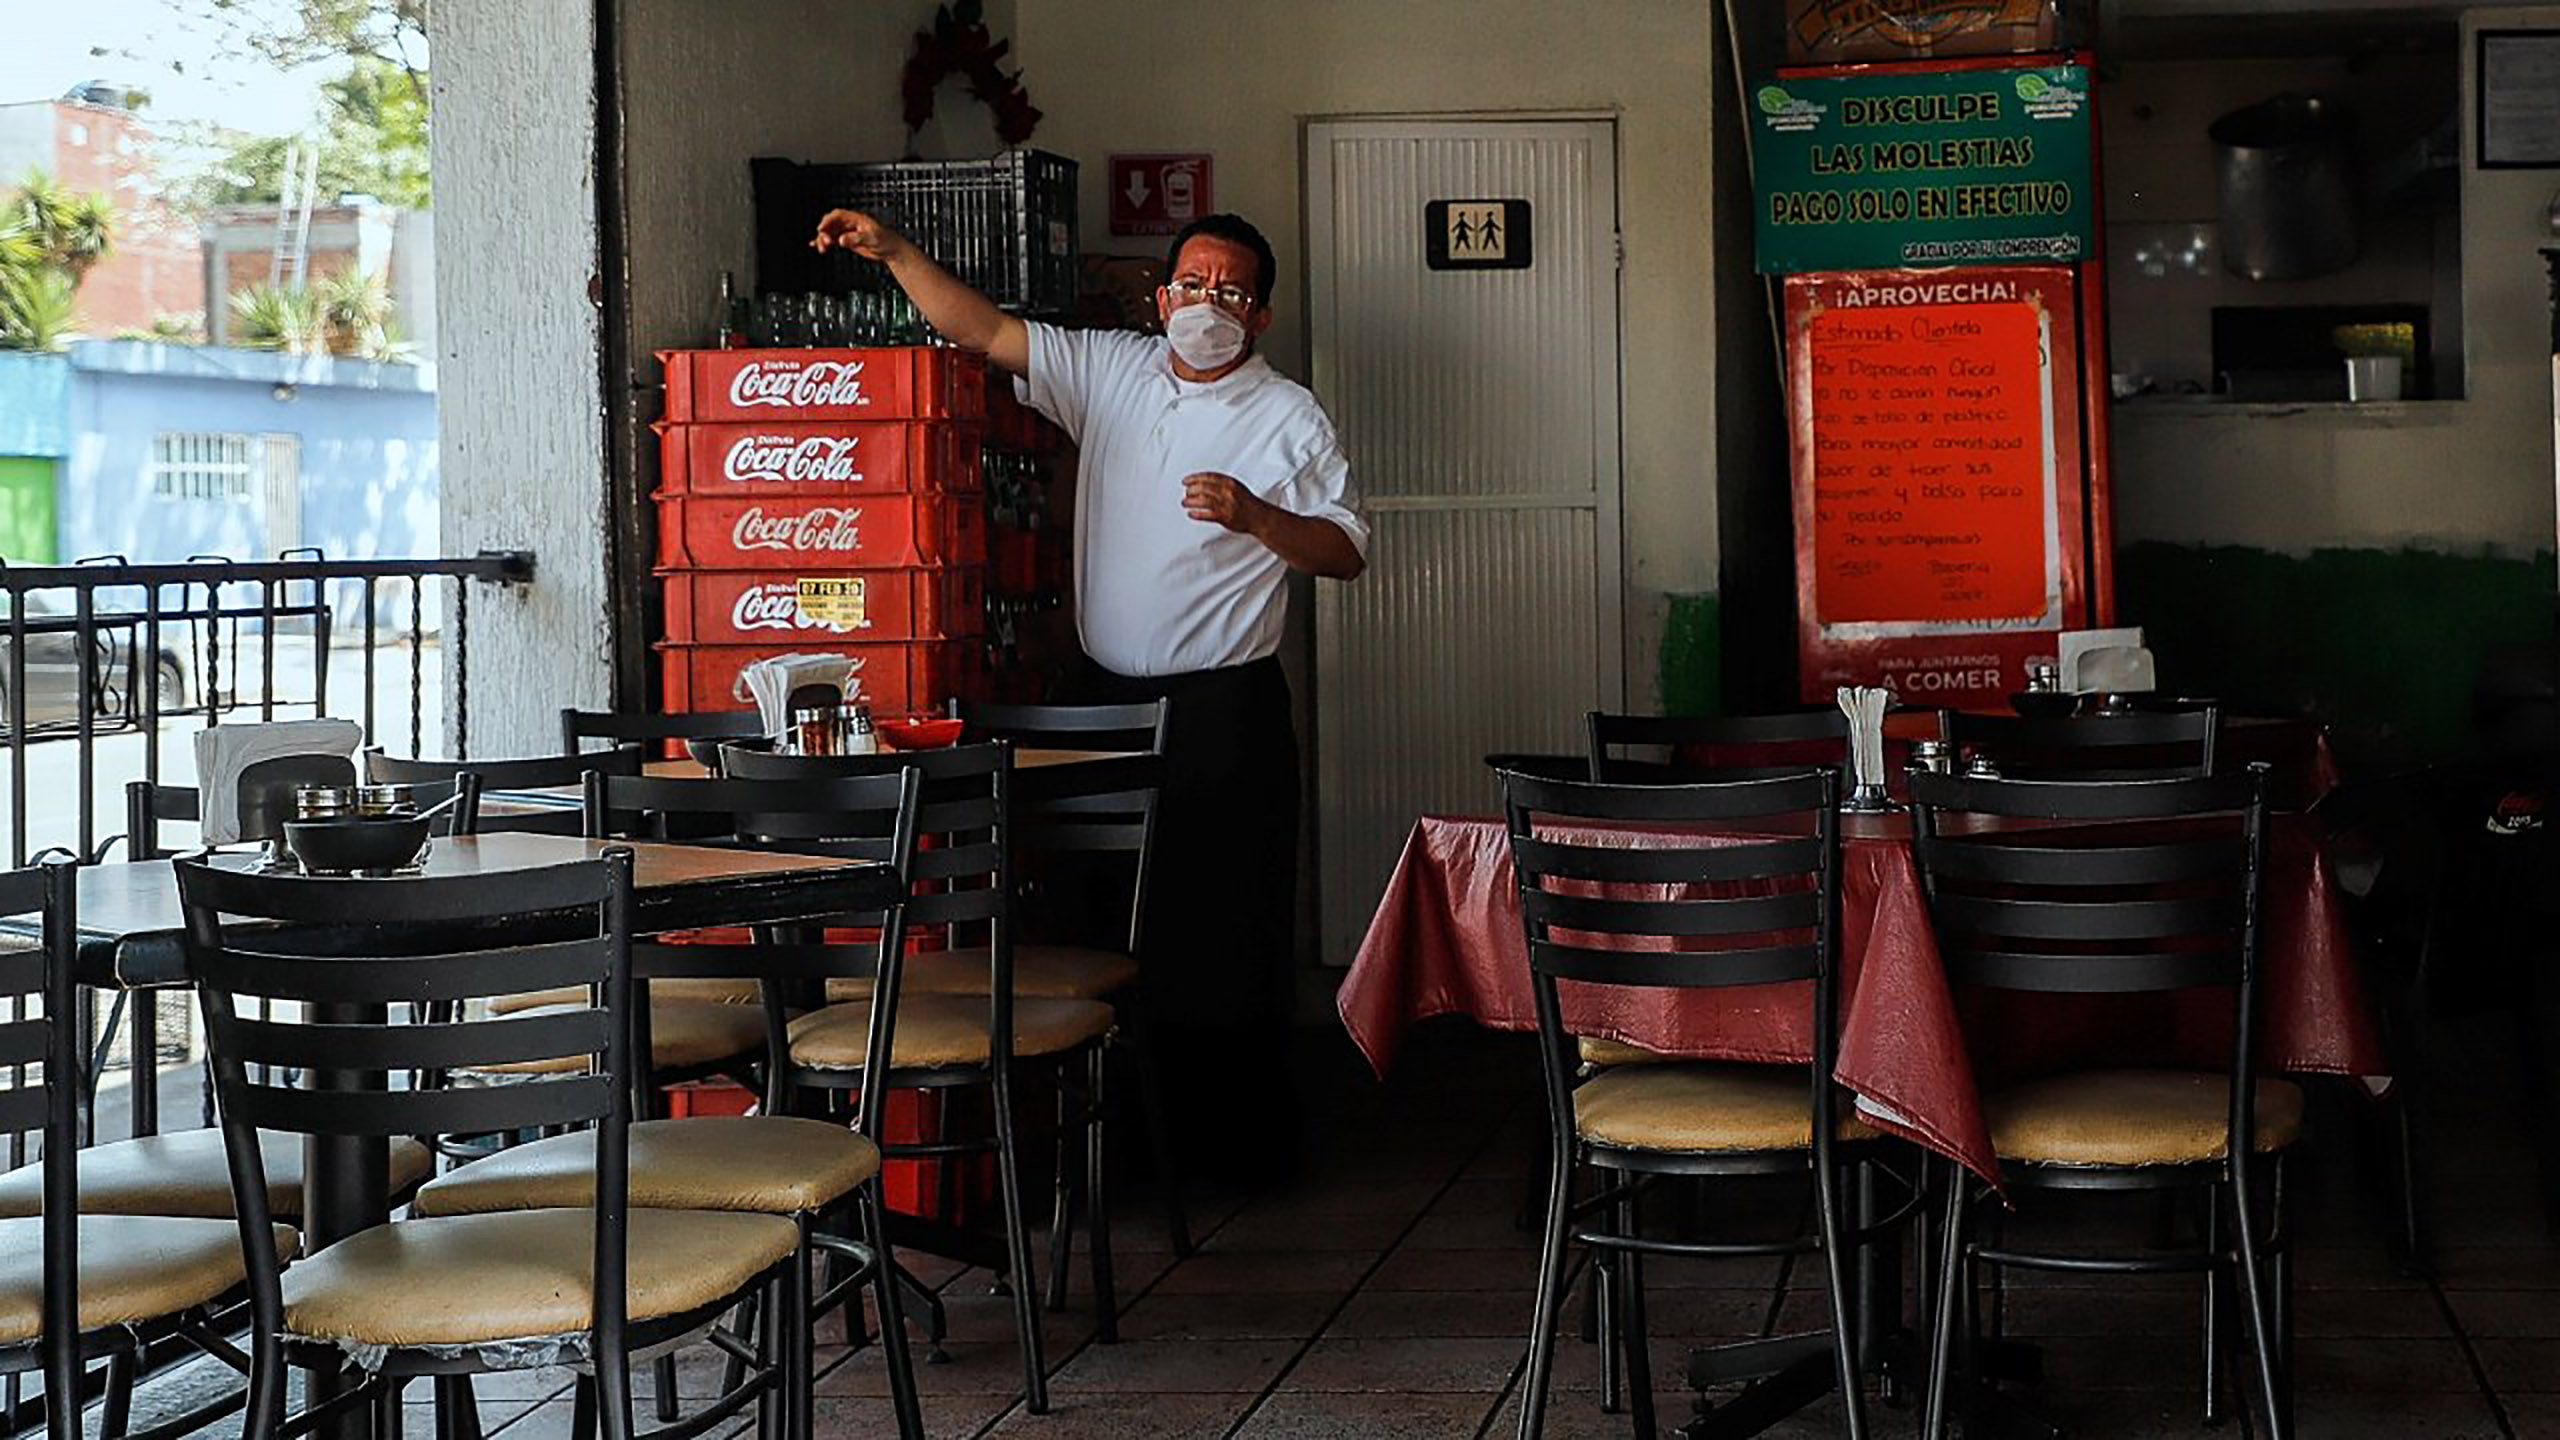 coronavirus, semáforo naranja, reapertura de restaurantes, semáforo rojo